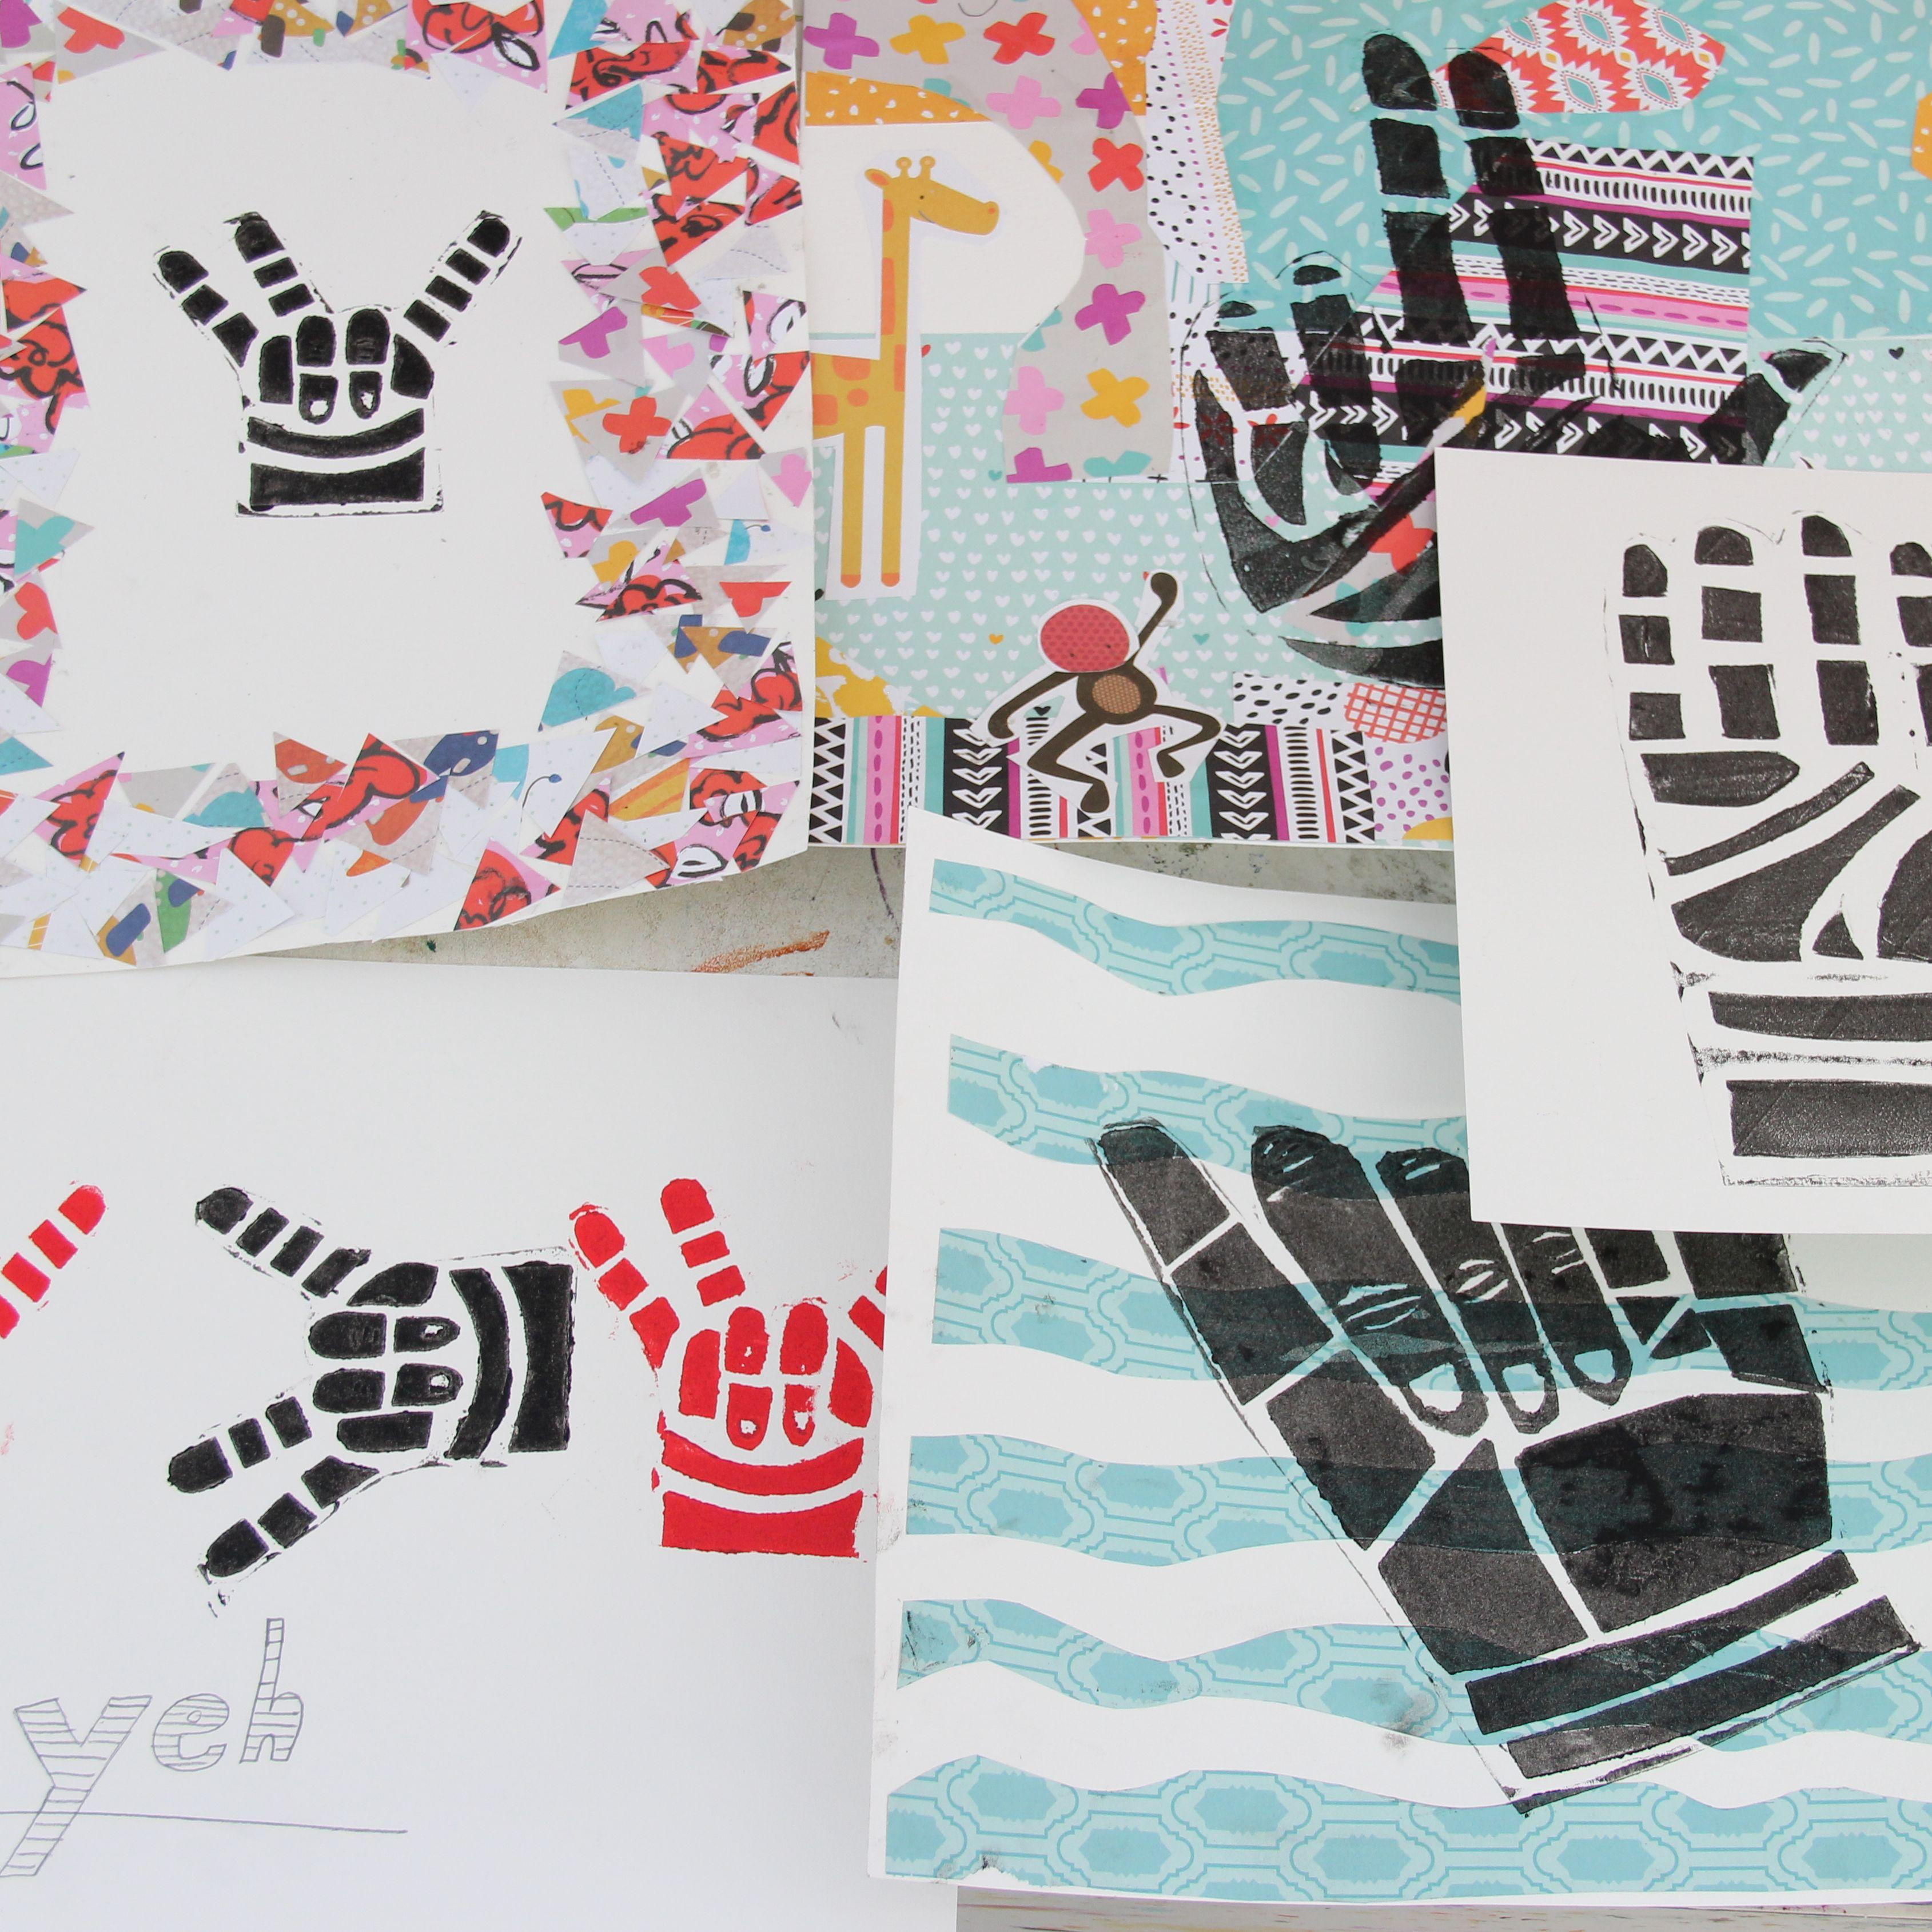 Printmaking | Hands Up Hands Down | 9-12 years